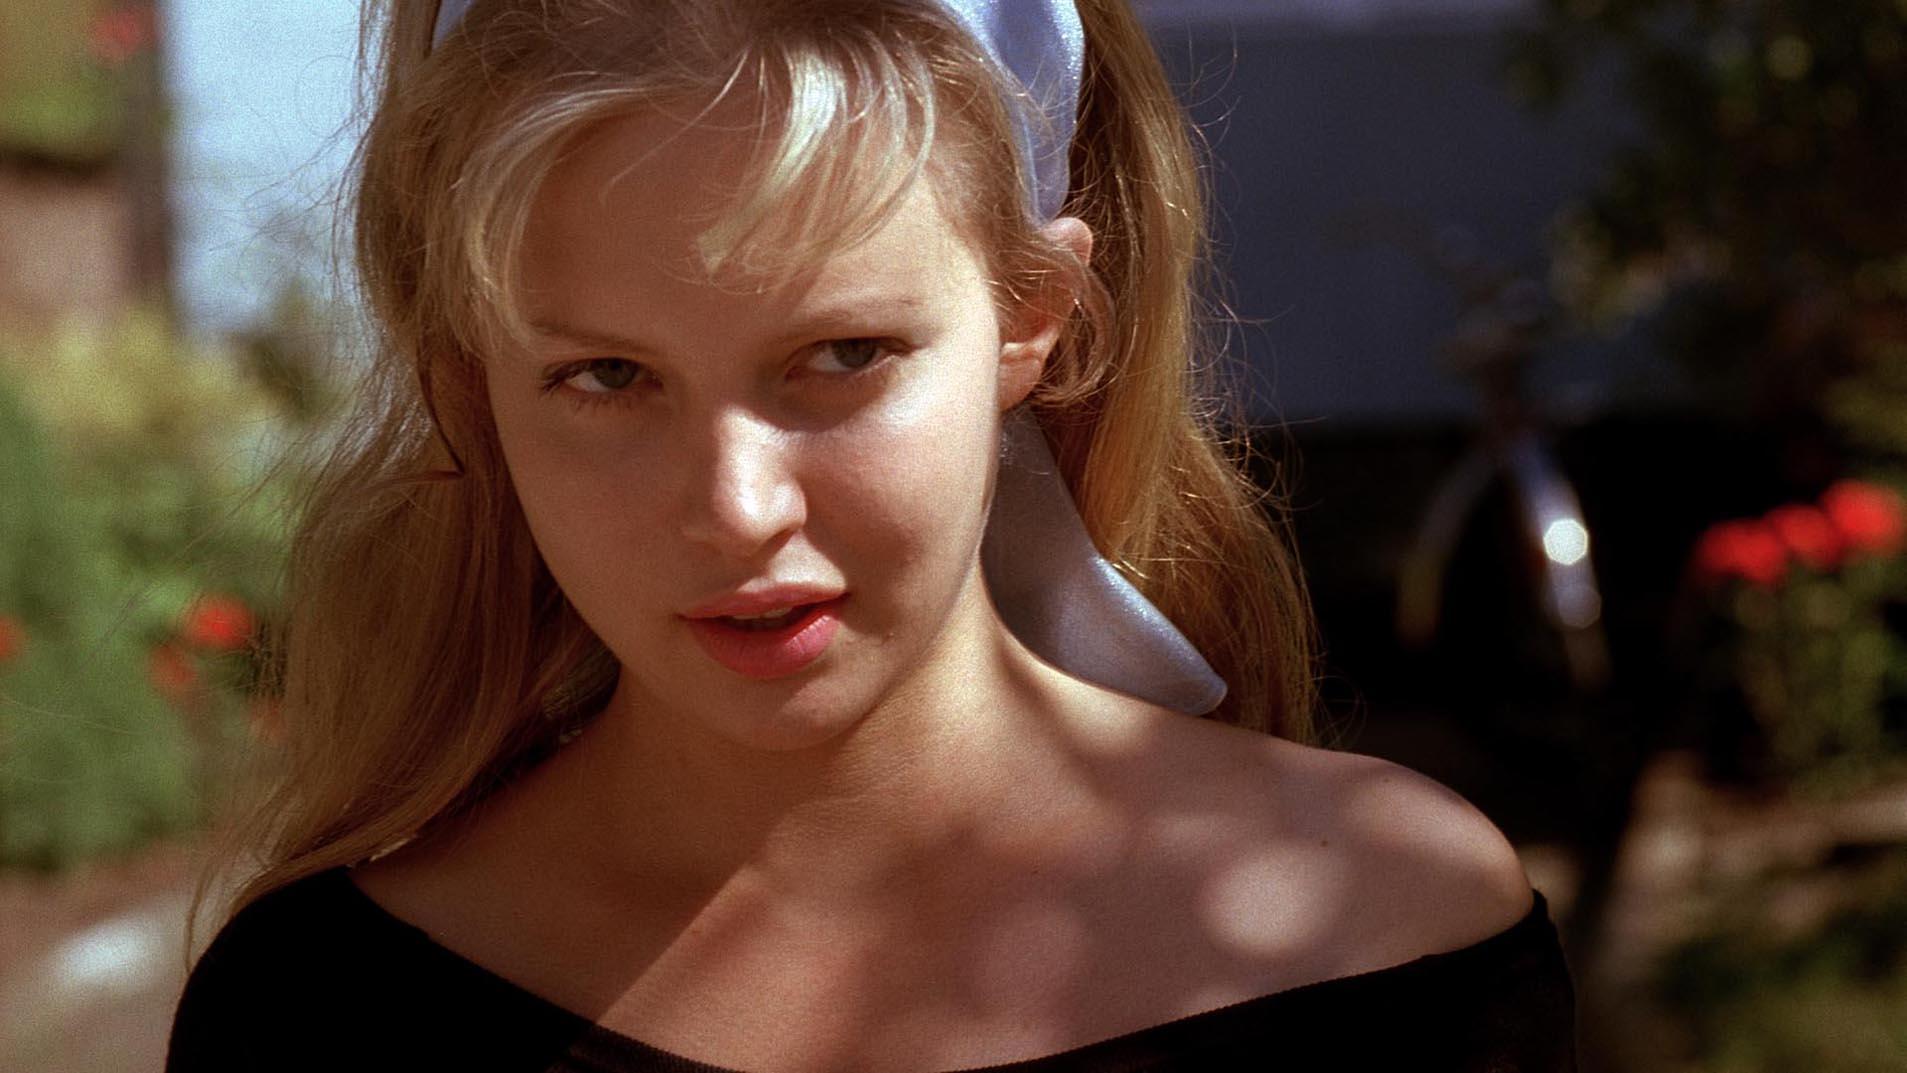 Belleza Sueca 2000 De Daniel Fridell